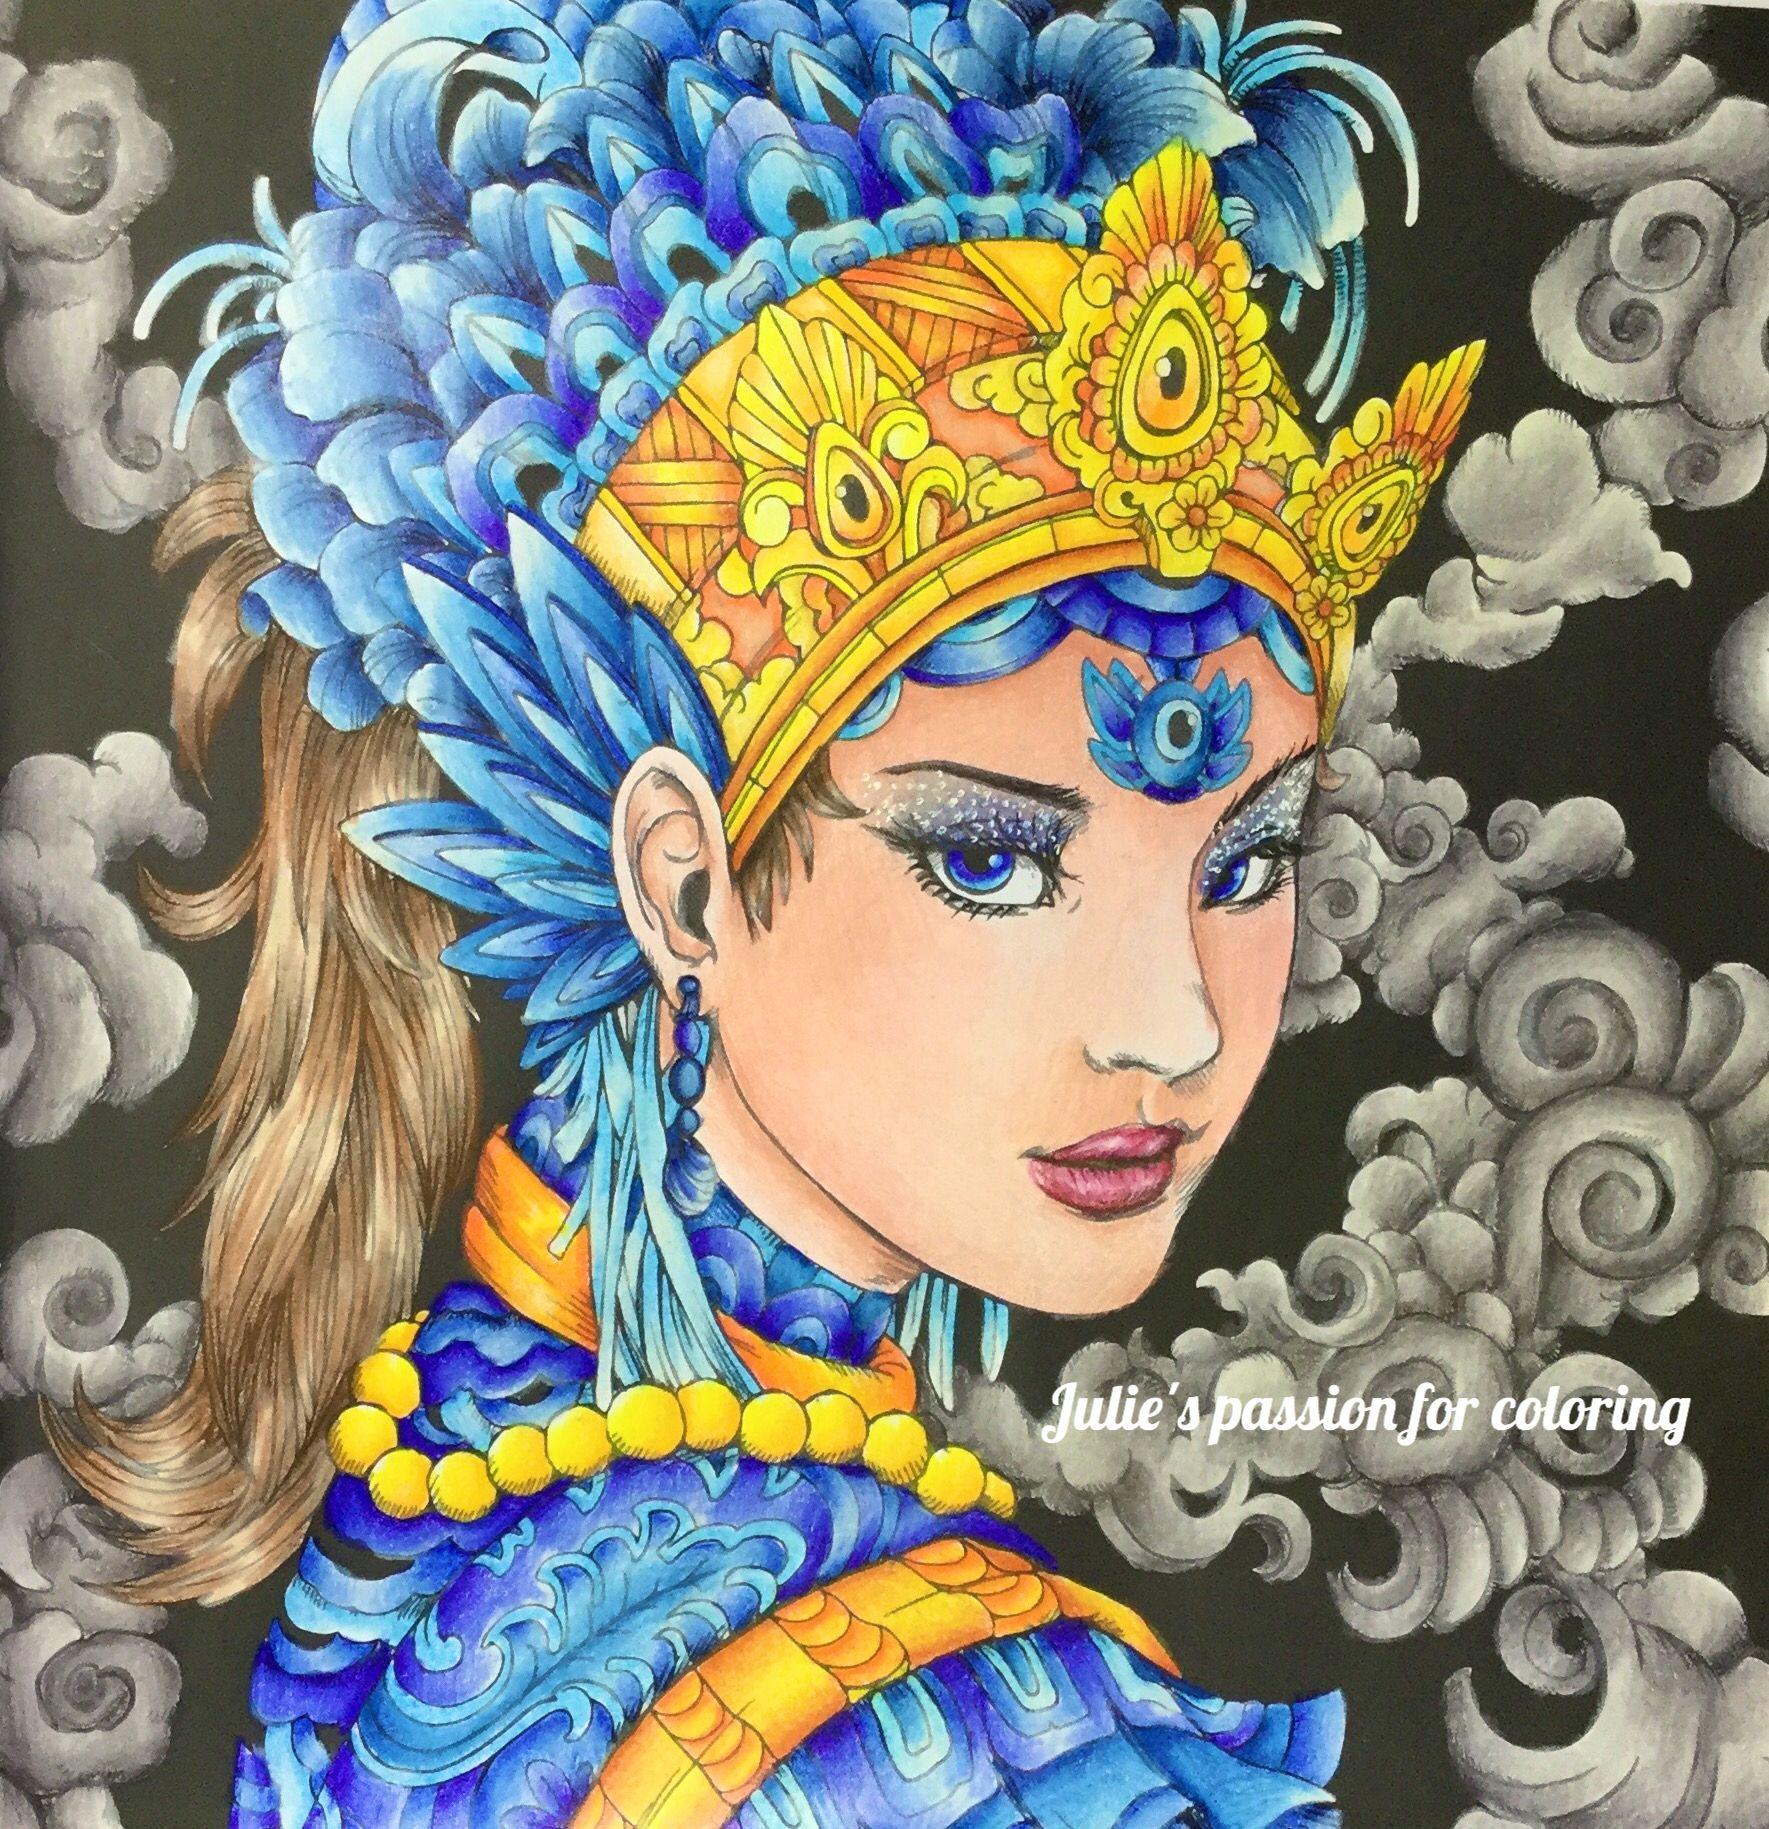 Fantasia Colored By Julie S Passion For Coloring Kleurboek Kleurplaten Tekenen